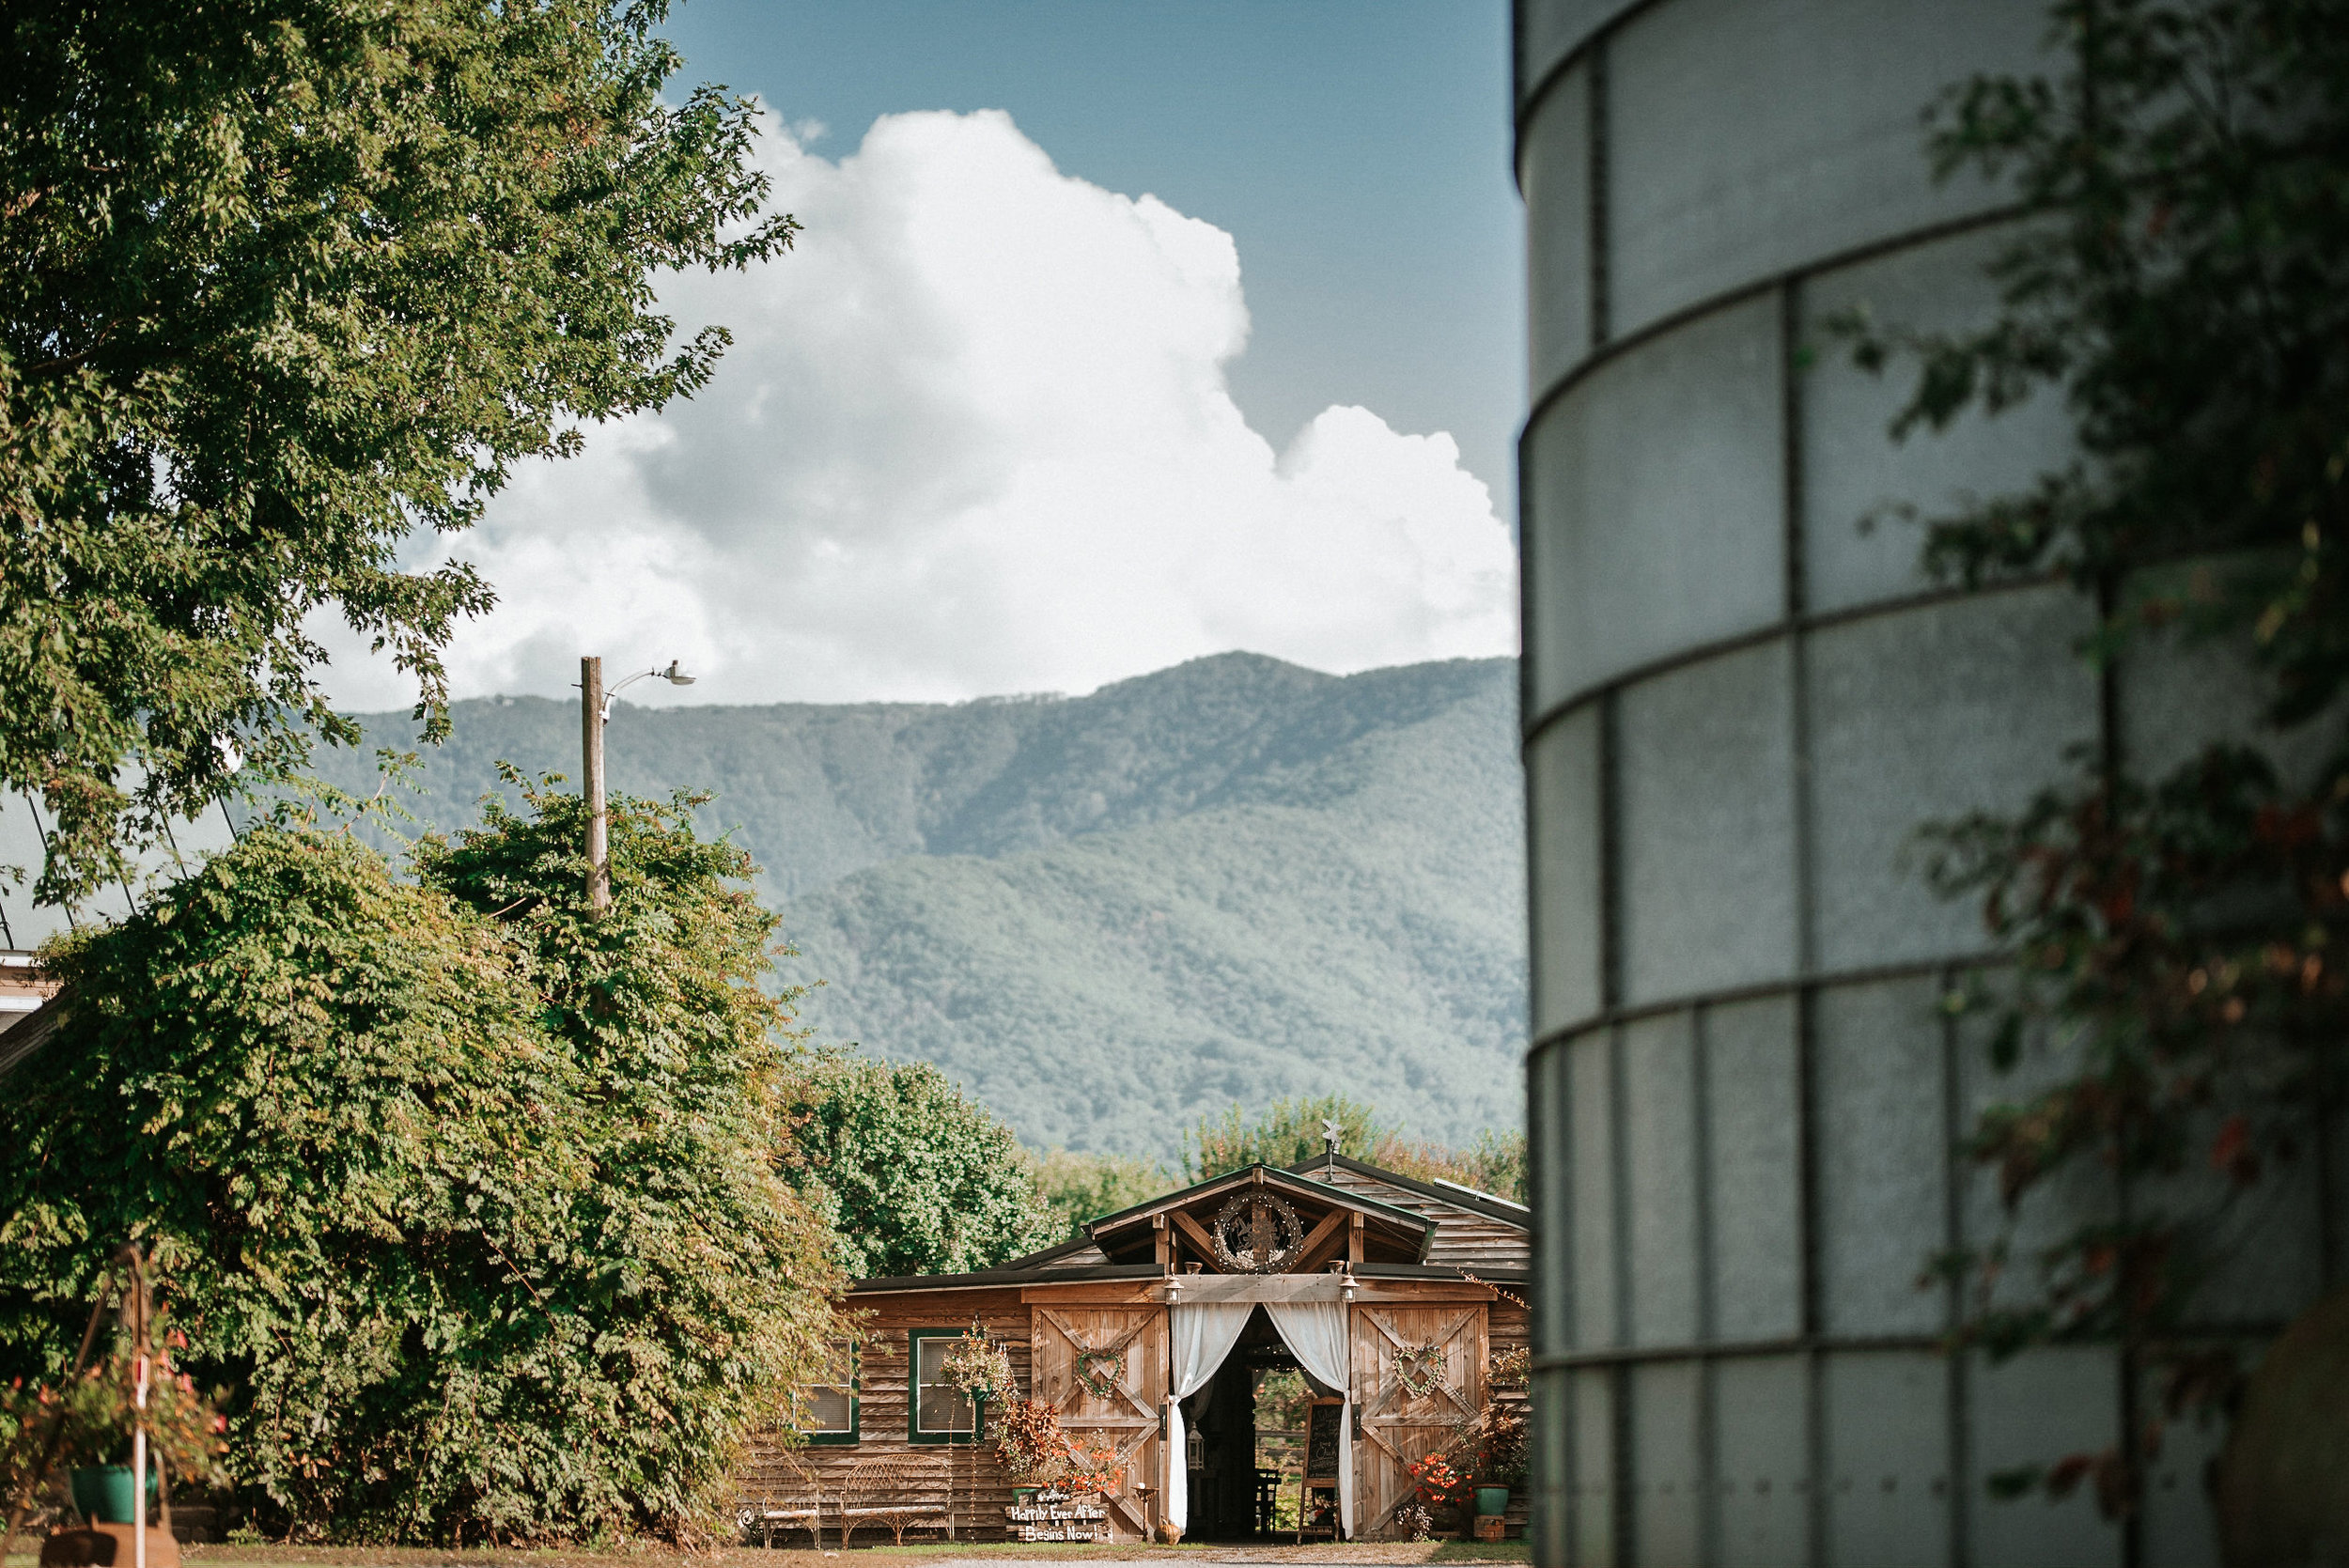 wedding venue shot at Khimaira Farm